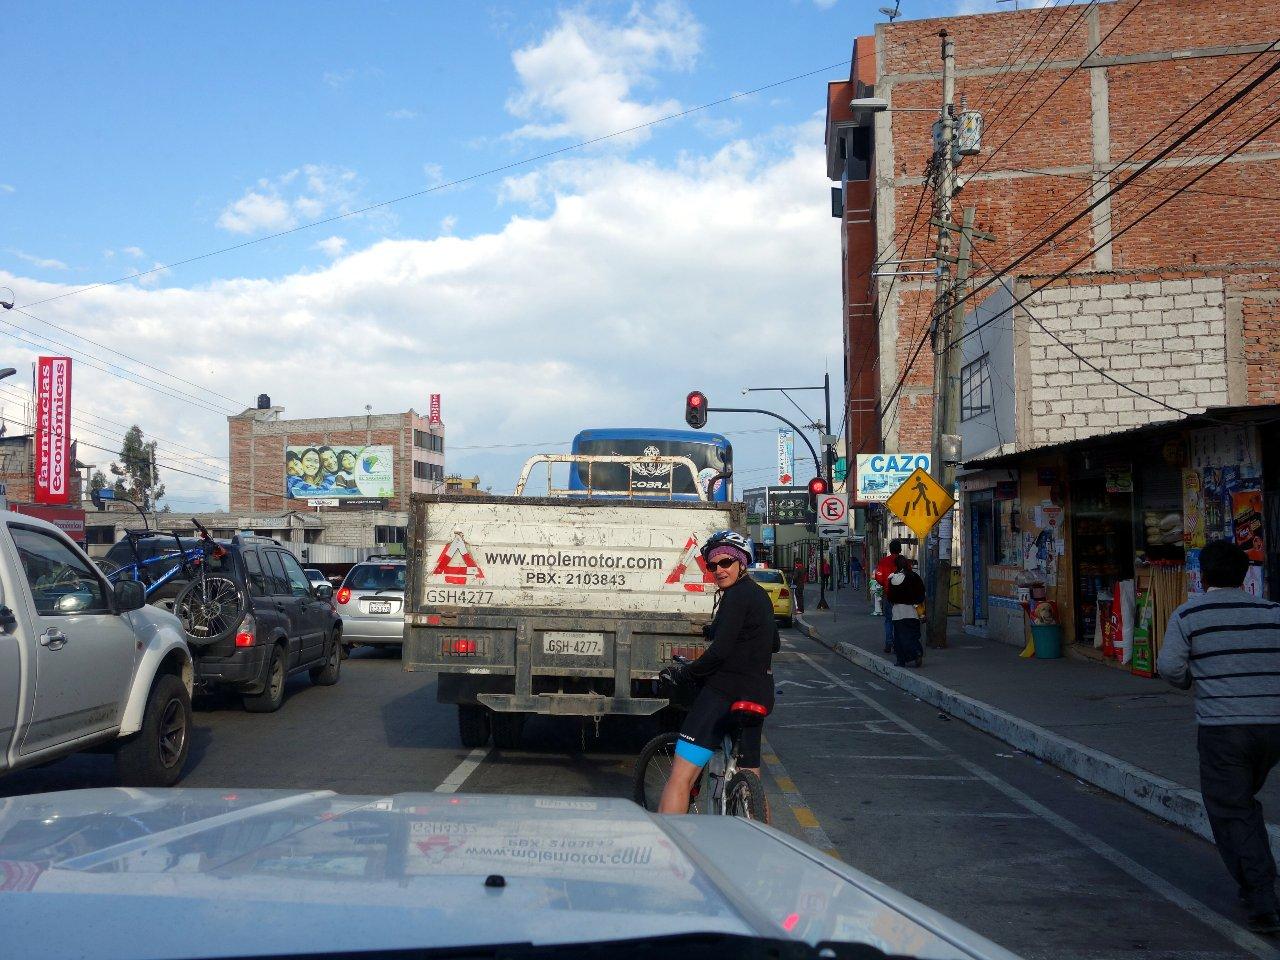 Edita stops at a traffic light on her ride through Riobamba